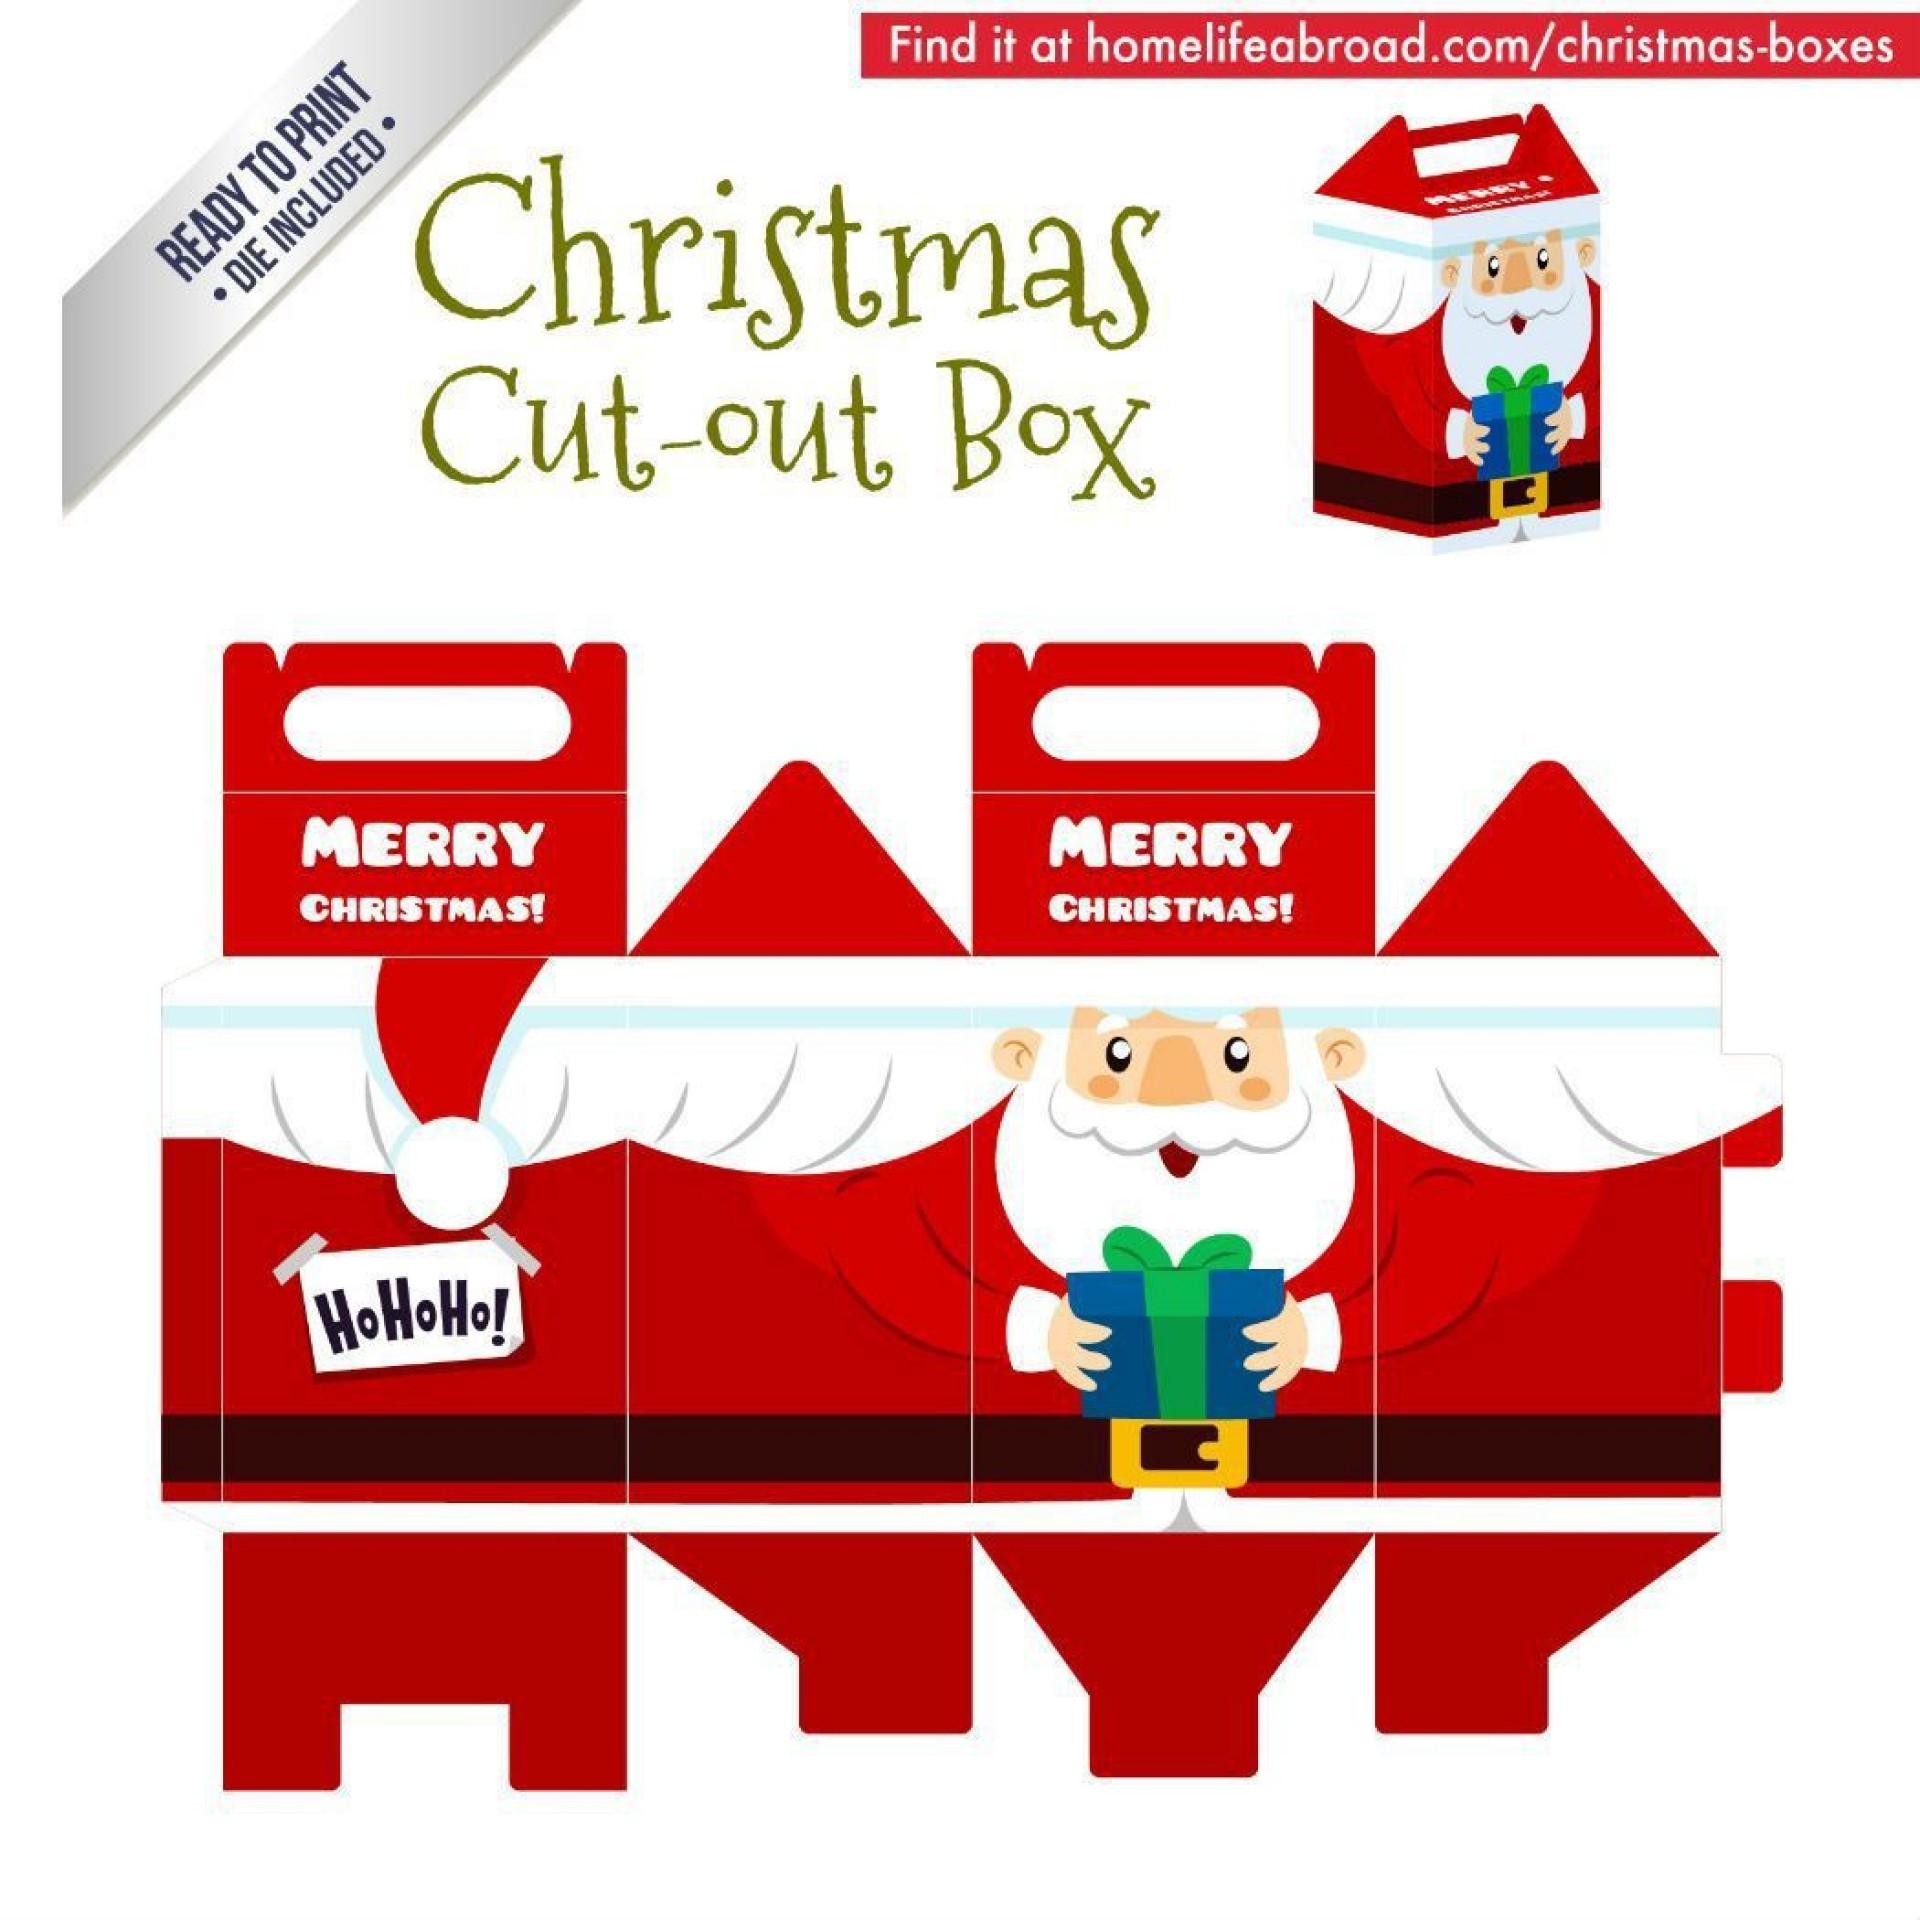 002 Remarkable Christma Gift Box Template Free Printable High Def  Tree1920